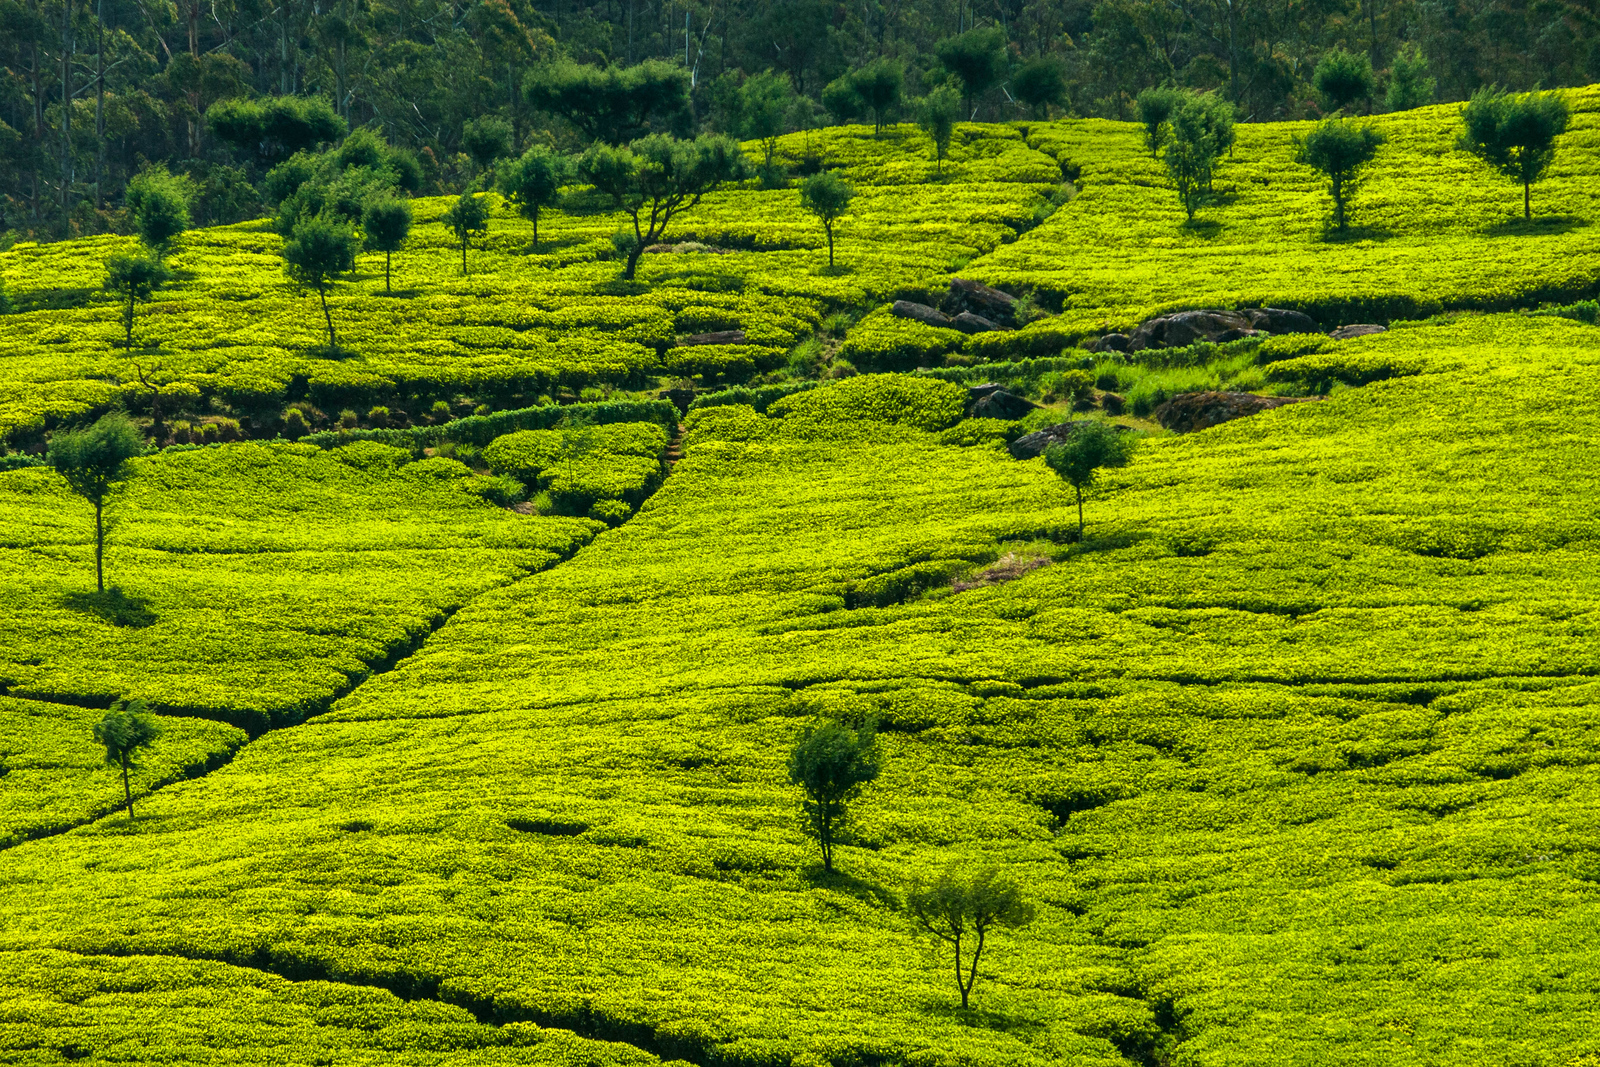 The stunning green hills of Nuwara Eliya, Sri Lanka